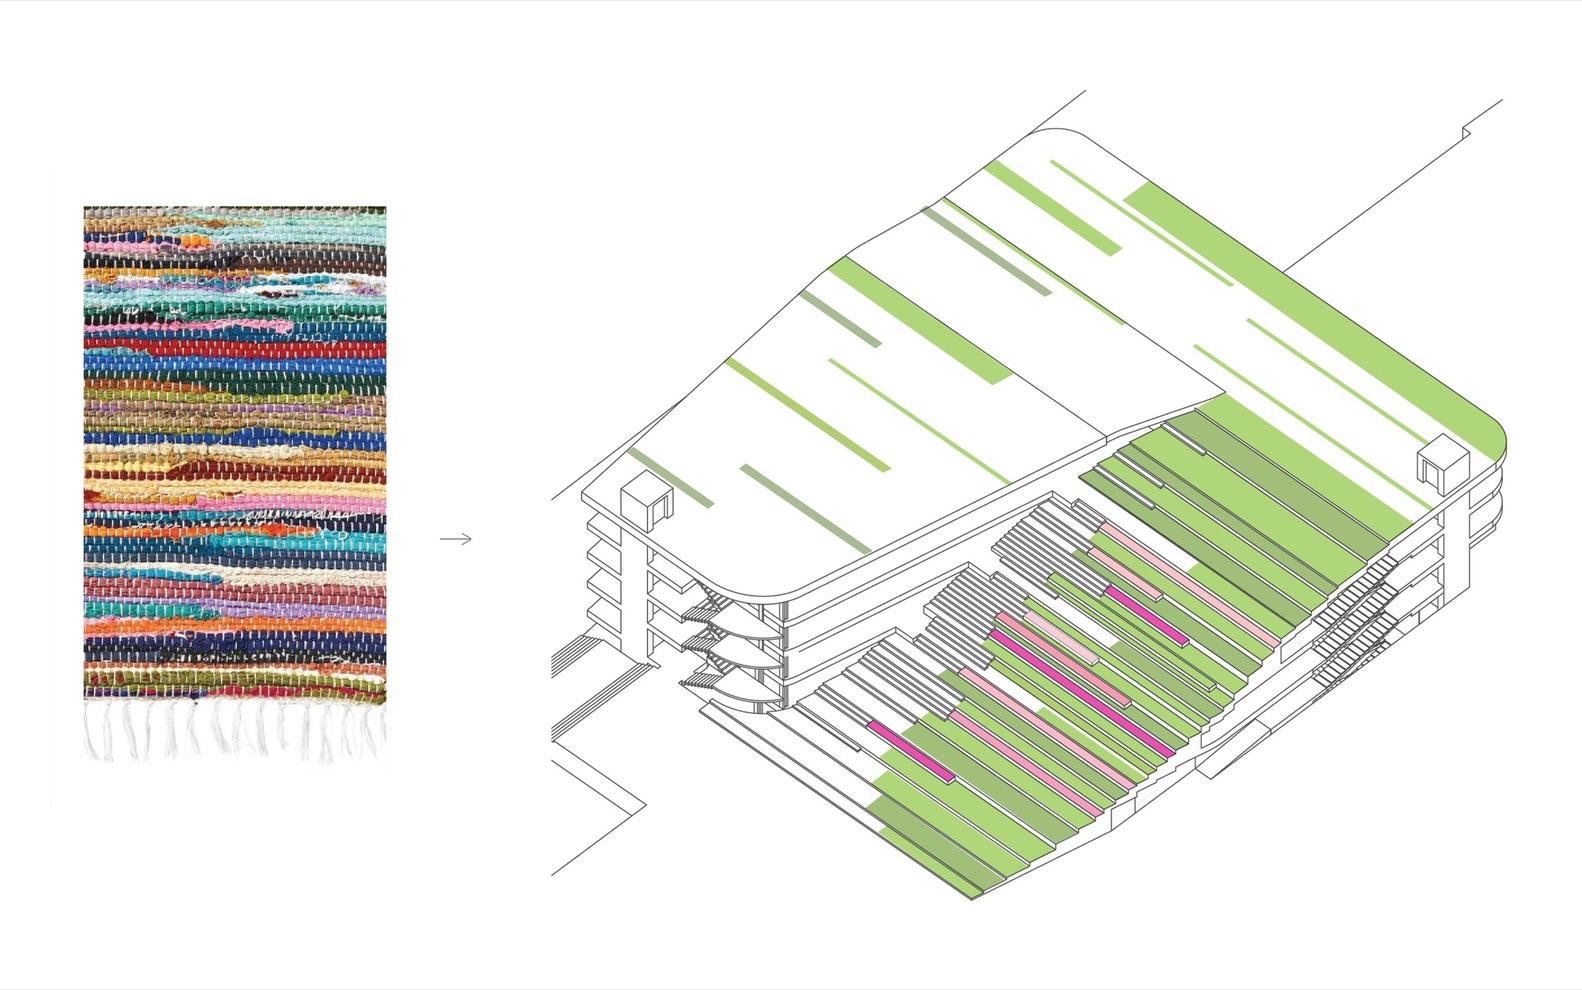 hight resolution of the parking garage that moonlights as a sledding slope white arkitekter henning larsen architects diagram